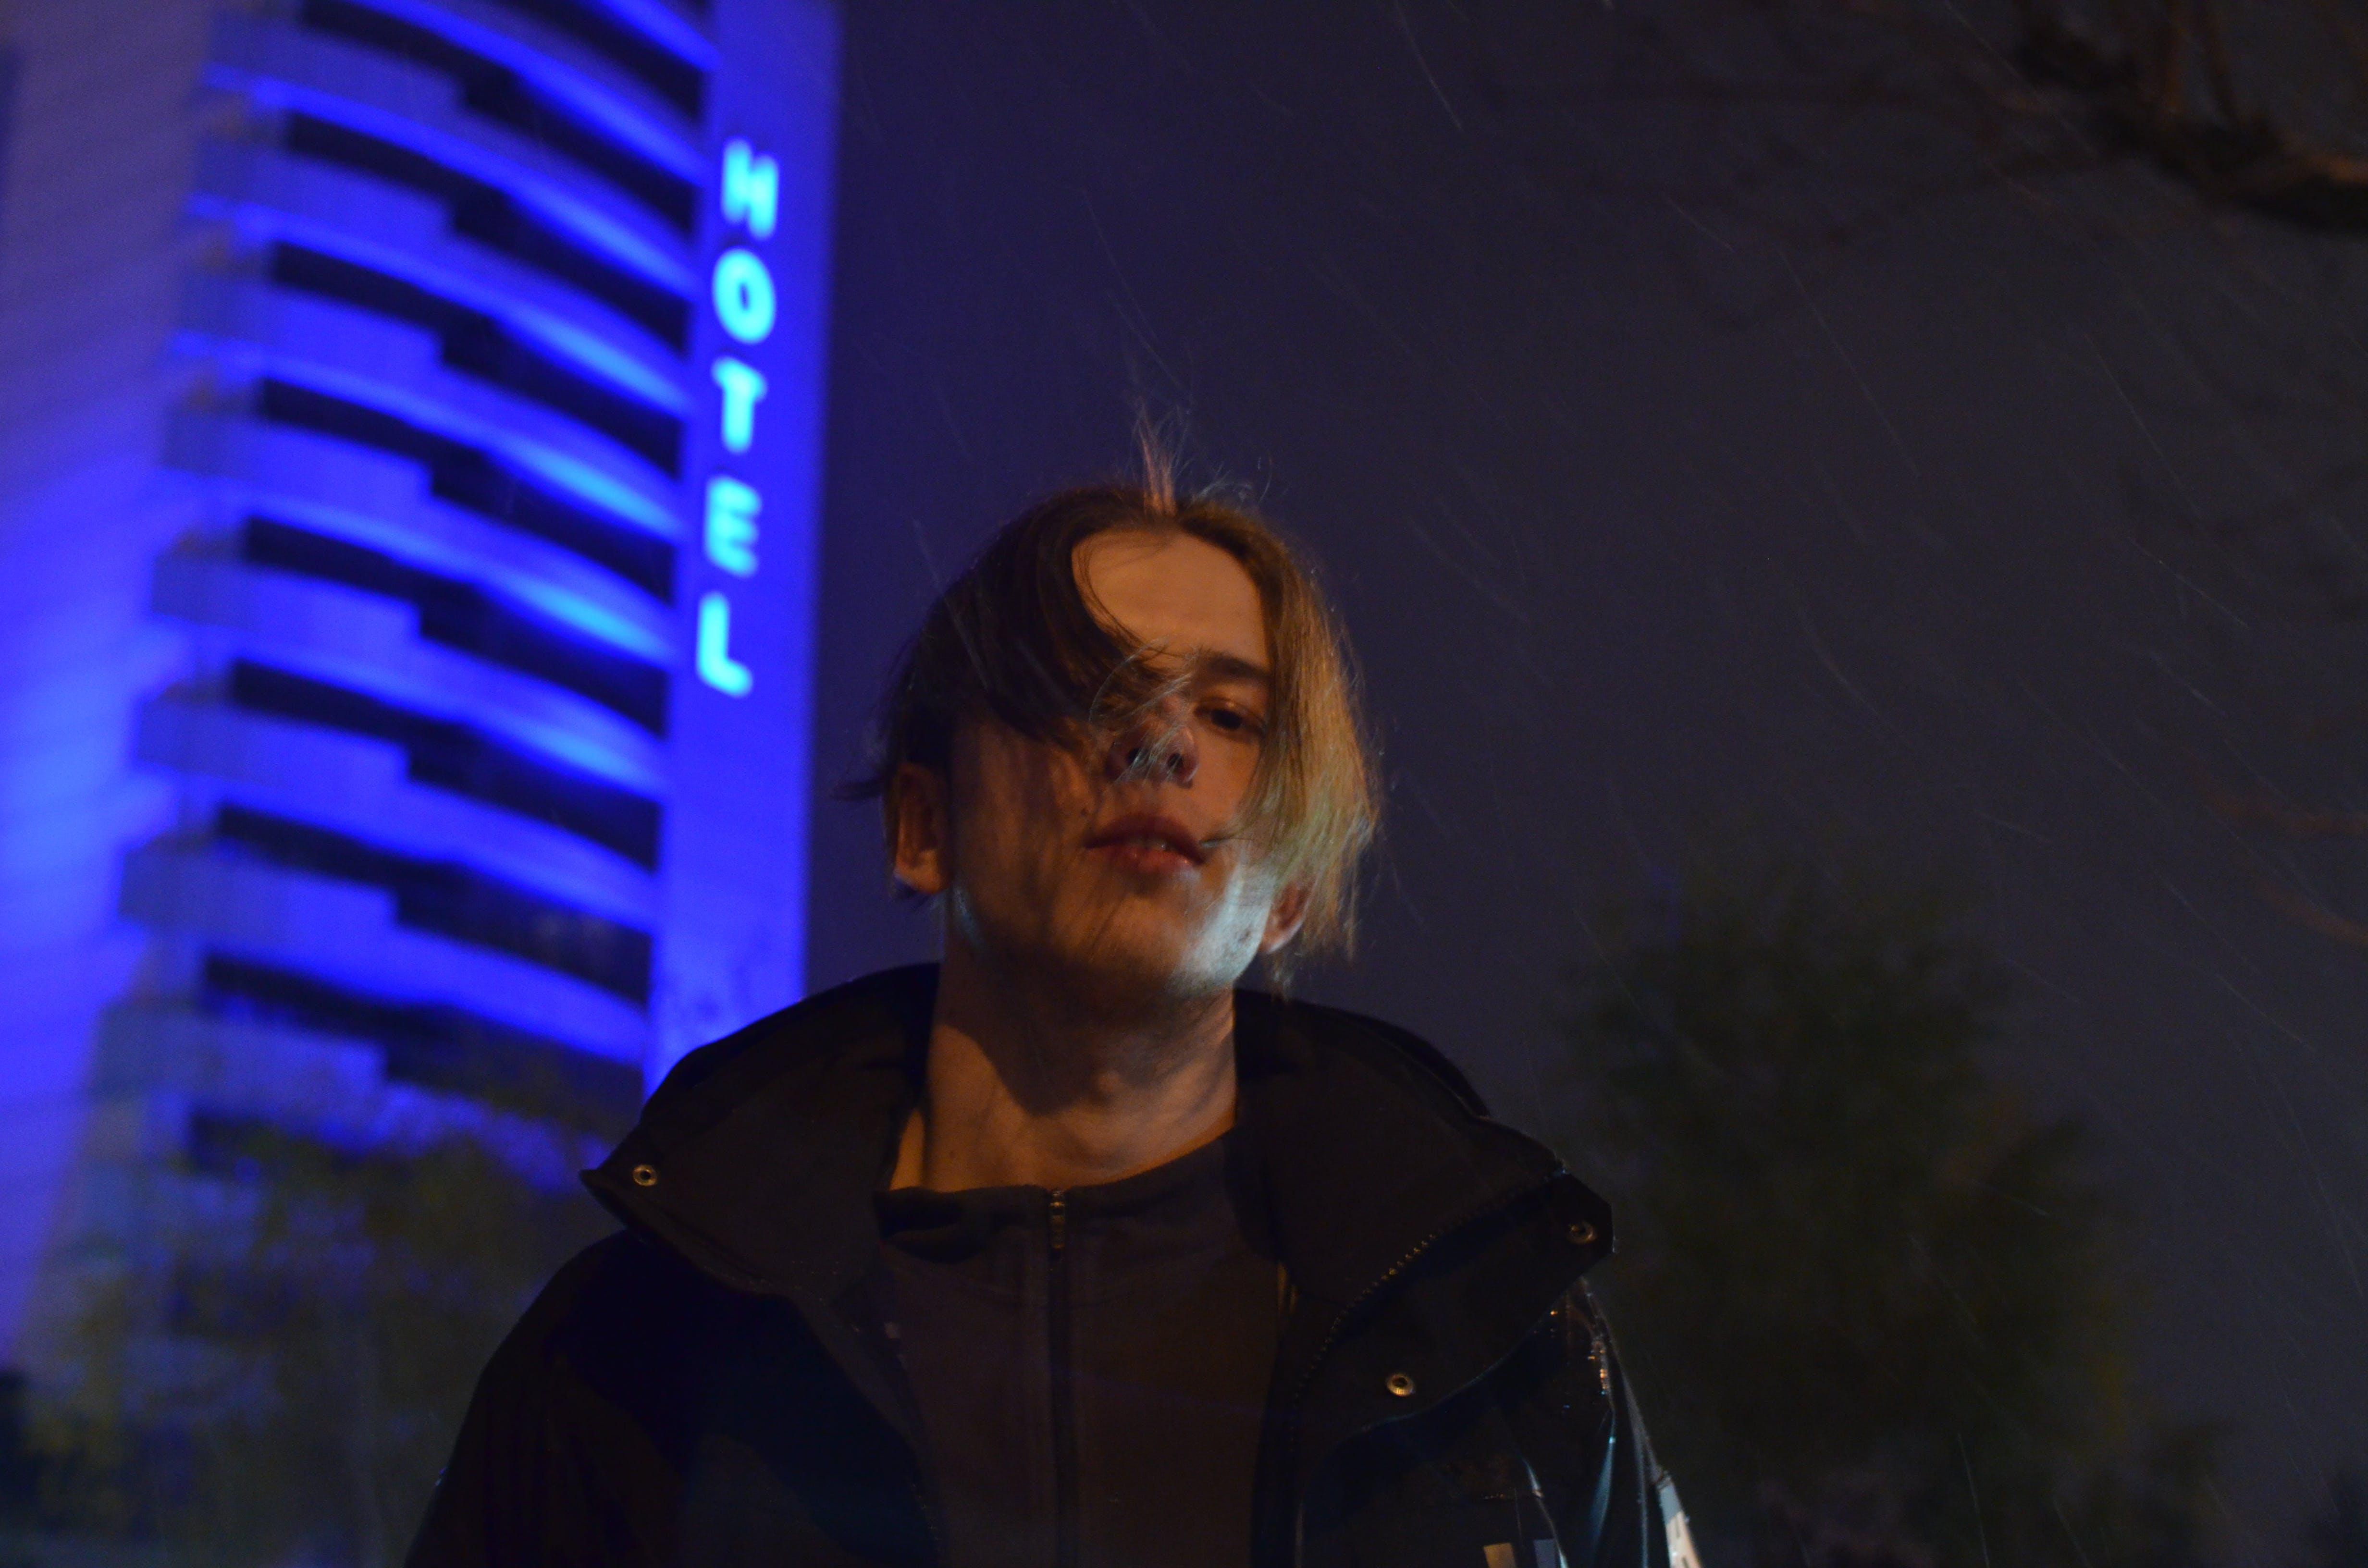 Man Wearing Black Zip-up Jacket in Front of Grey Hotel